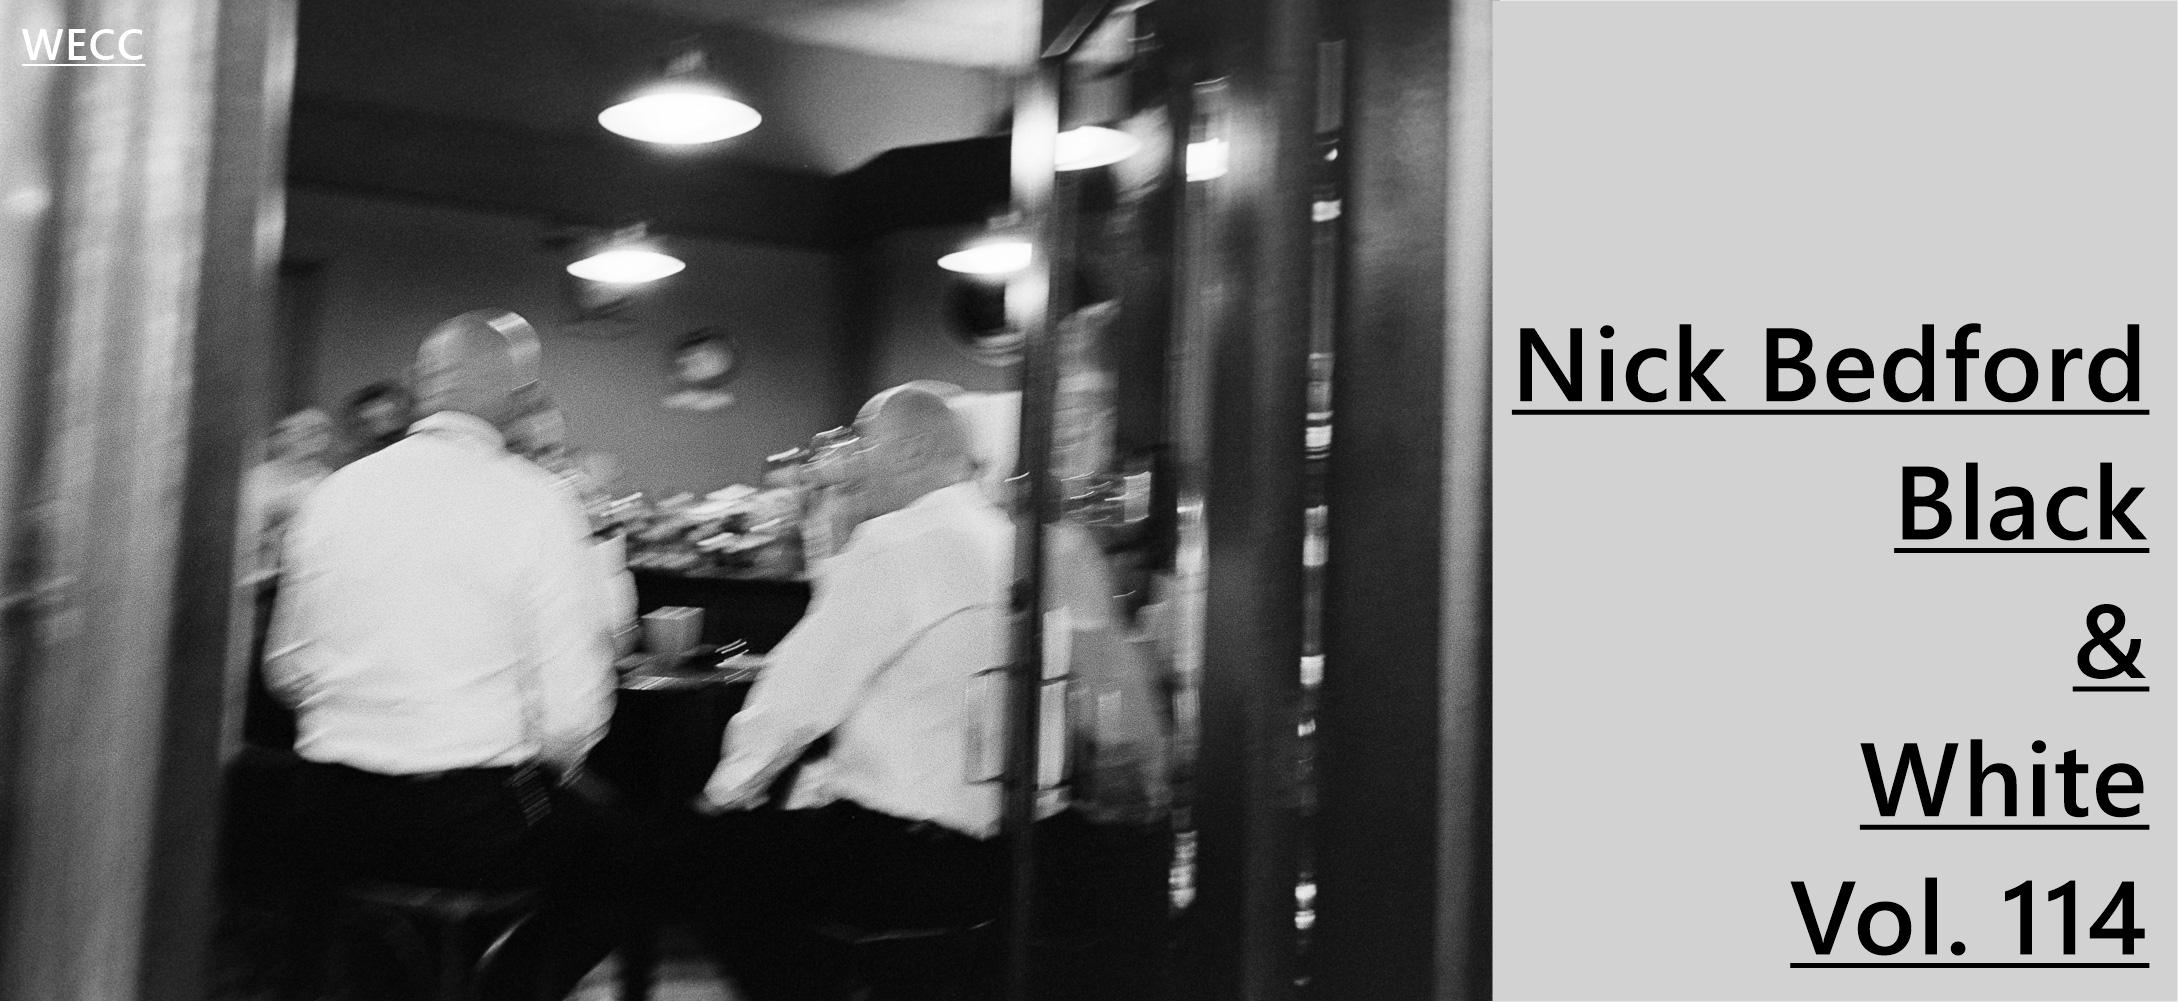 20180310+-+Roll+158+-+012-Nick-Bedford,-Photographer-Black+and+White,+Film,+Kodak+TRI-X+400,+Leica+M7,+Street+Photography,+Voigtlander+35mm+F1.7+Ultron+Asph vbvb.jpg